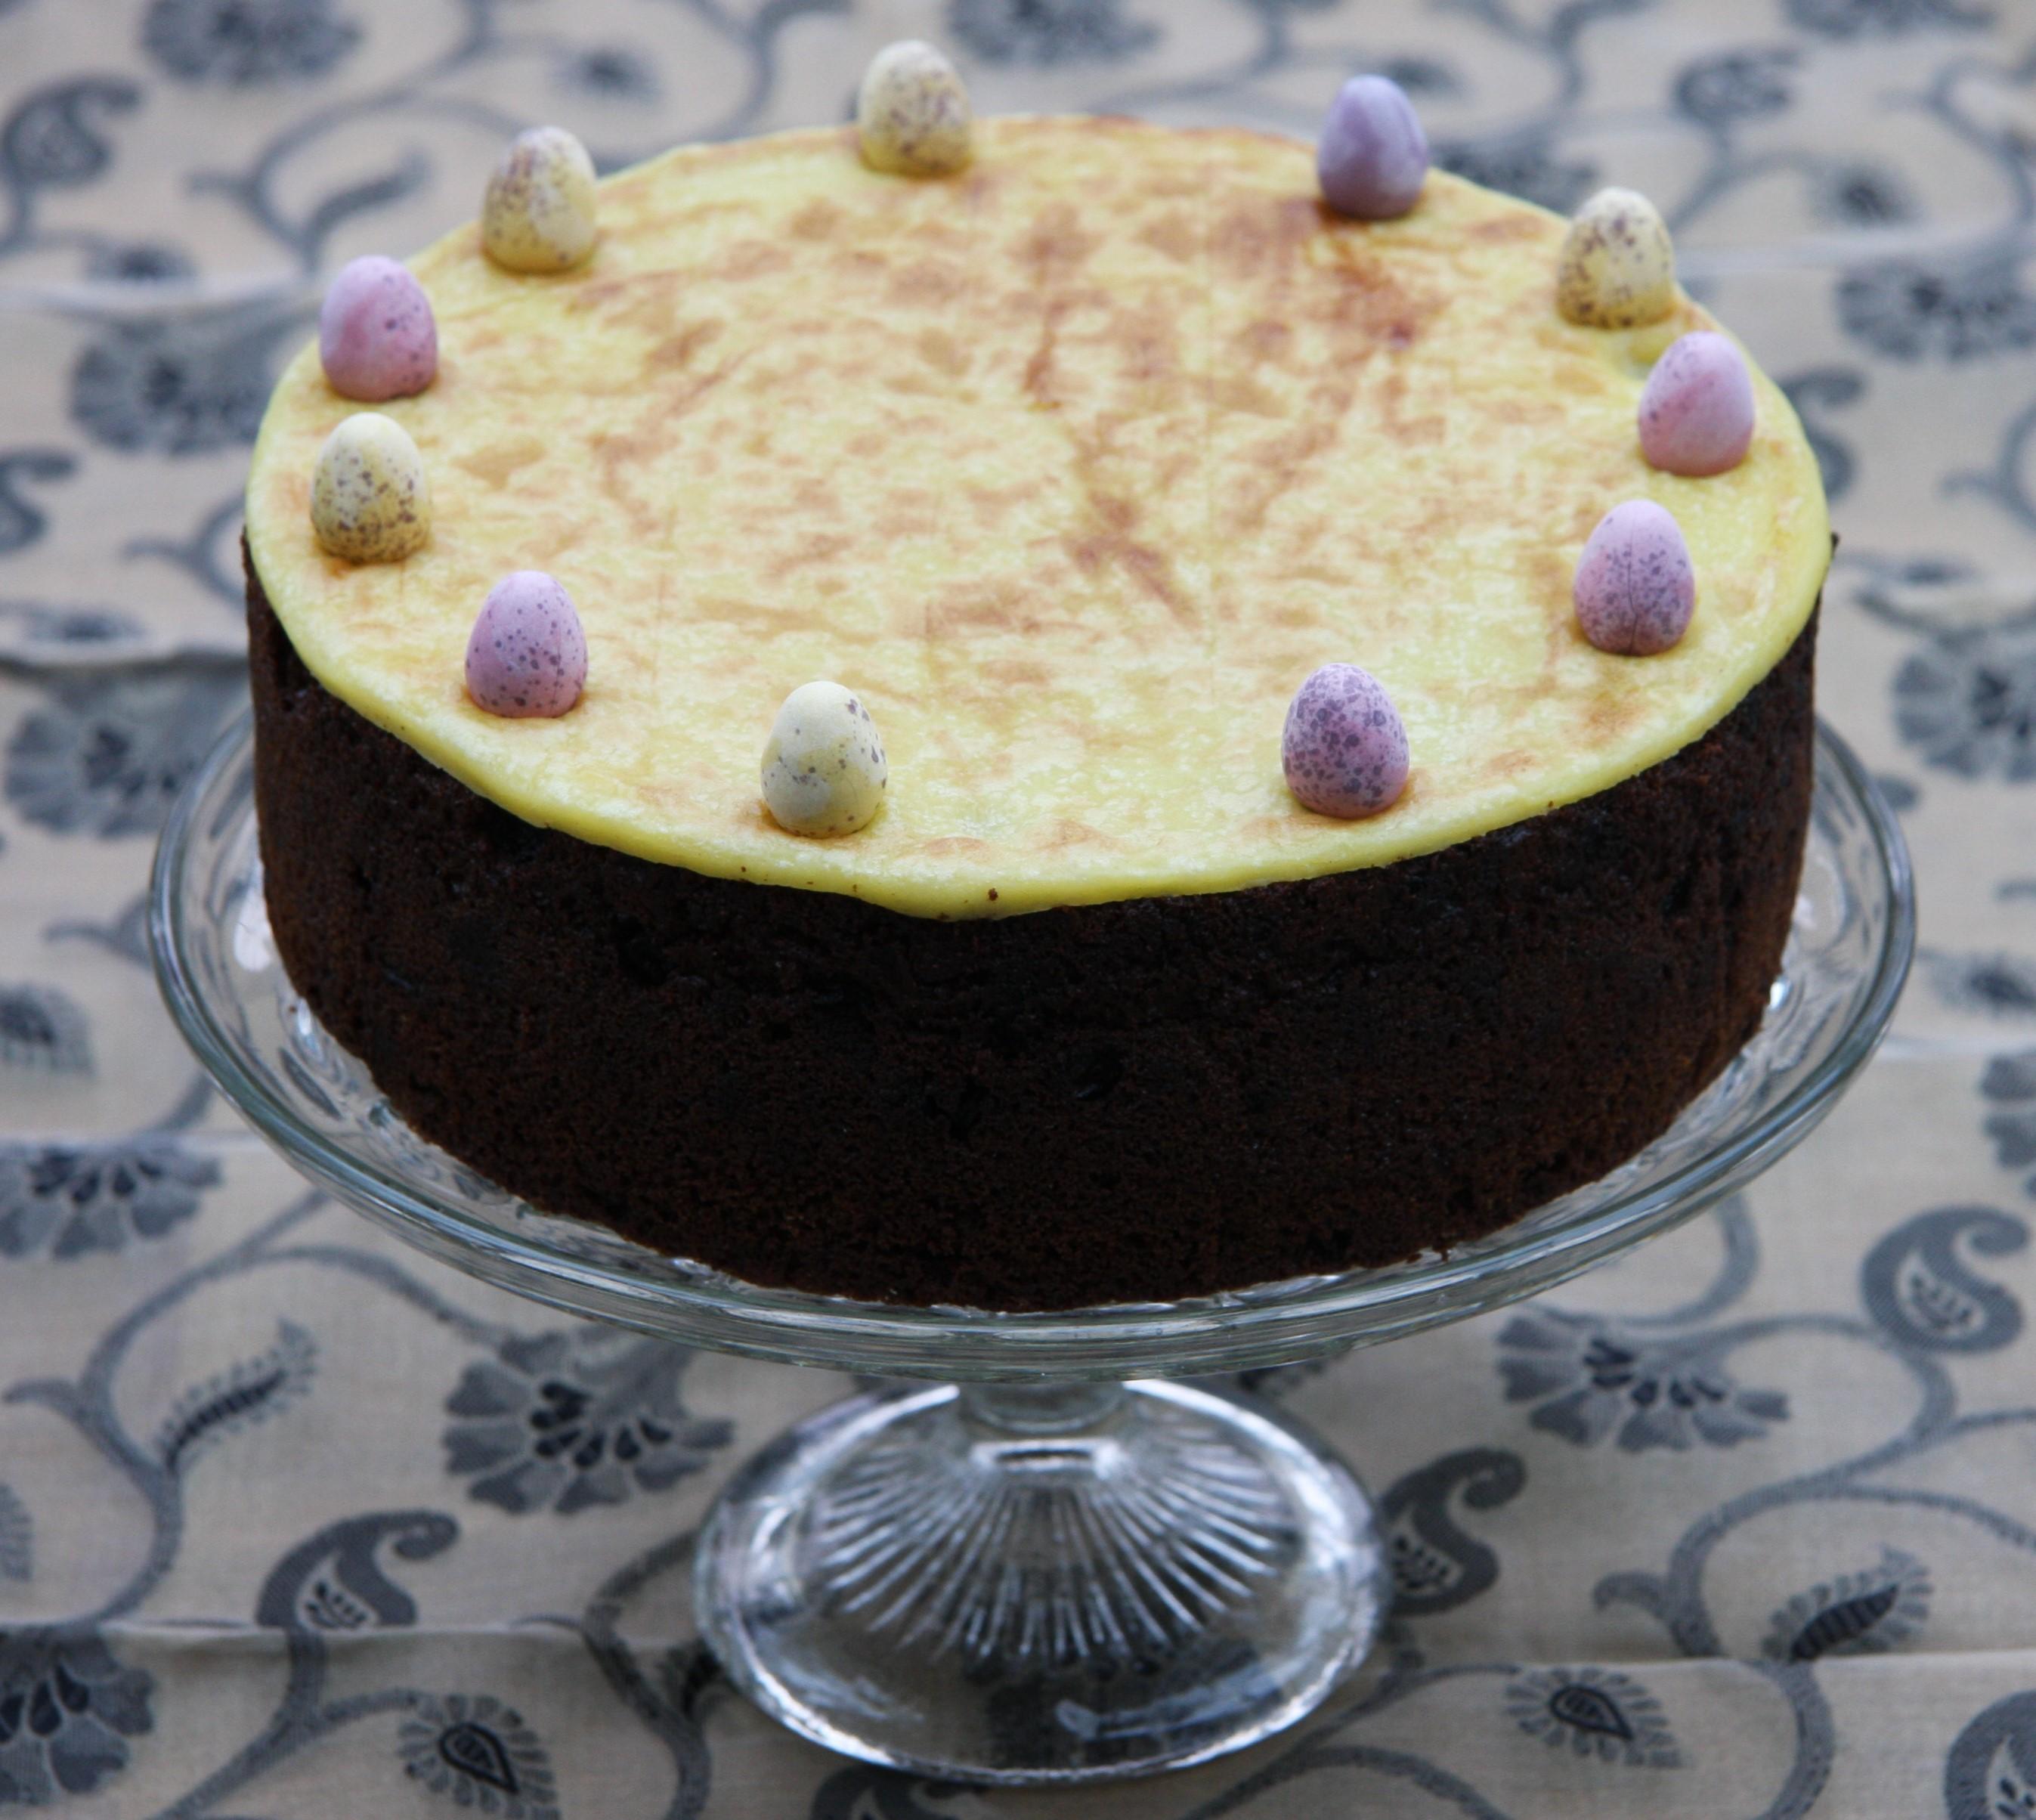 Lemon Layer Cake General Robert E Lee Cake Recipes Dishmaps ...